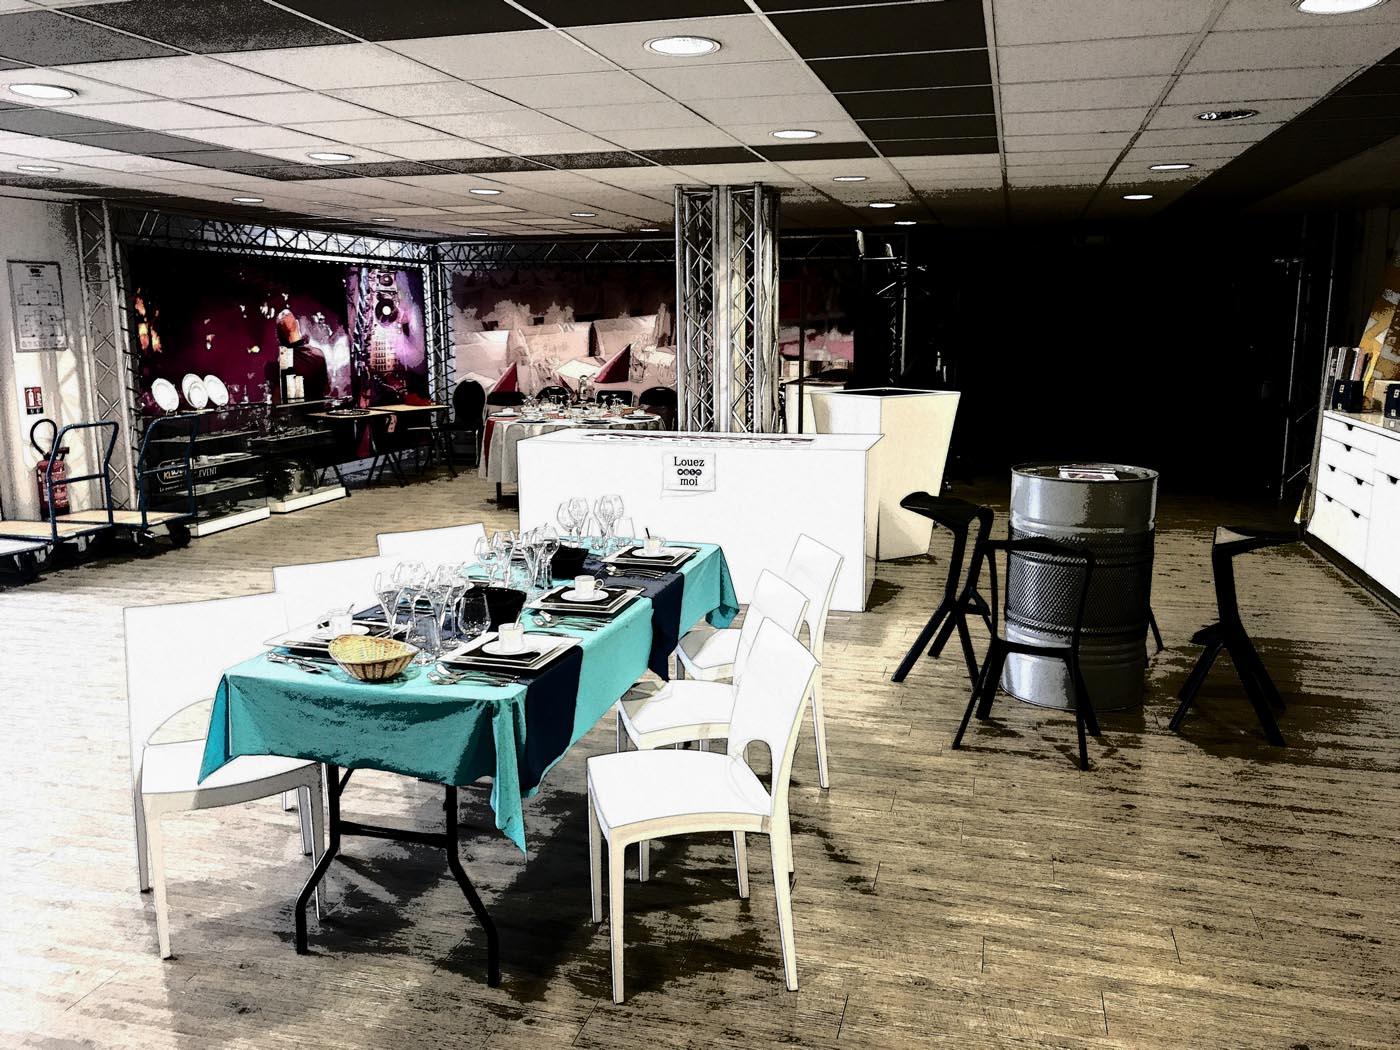 Showroom de locareception agence paris-sud